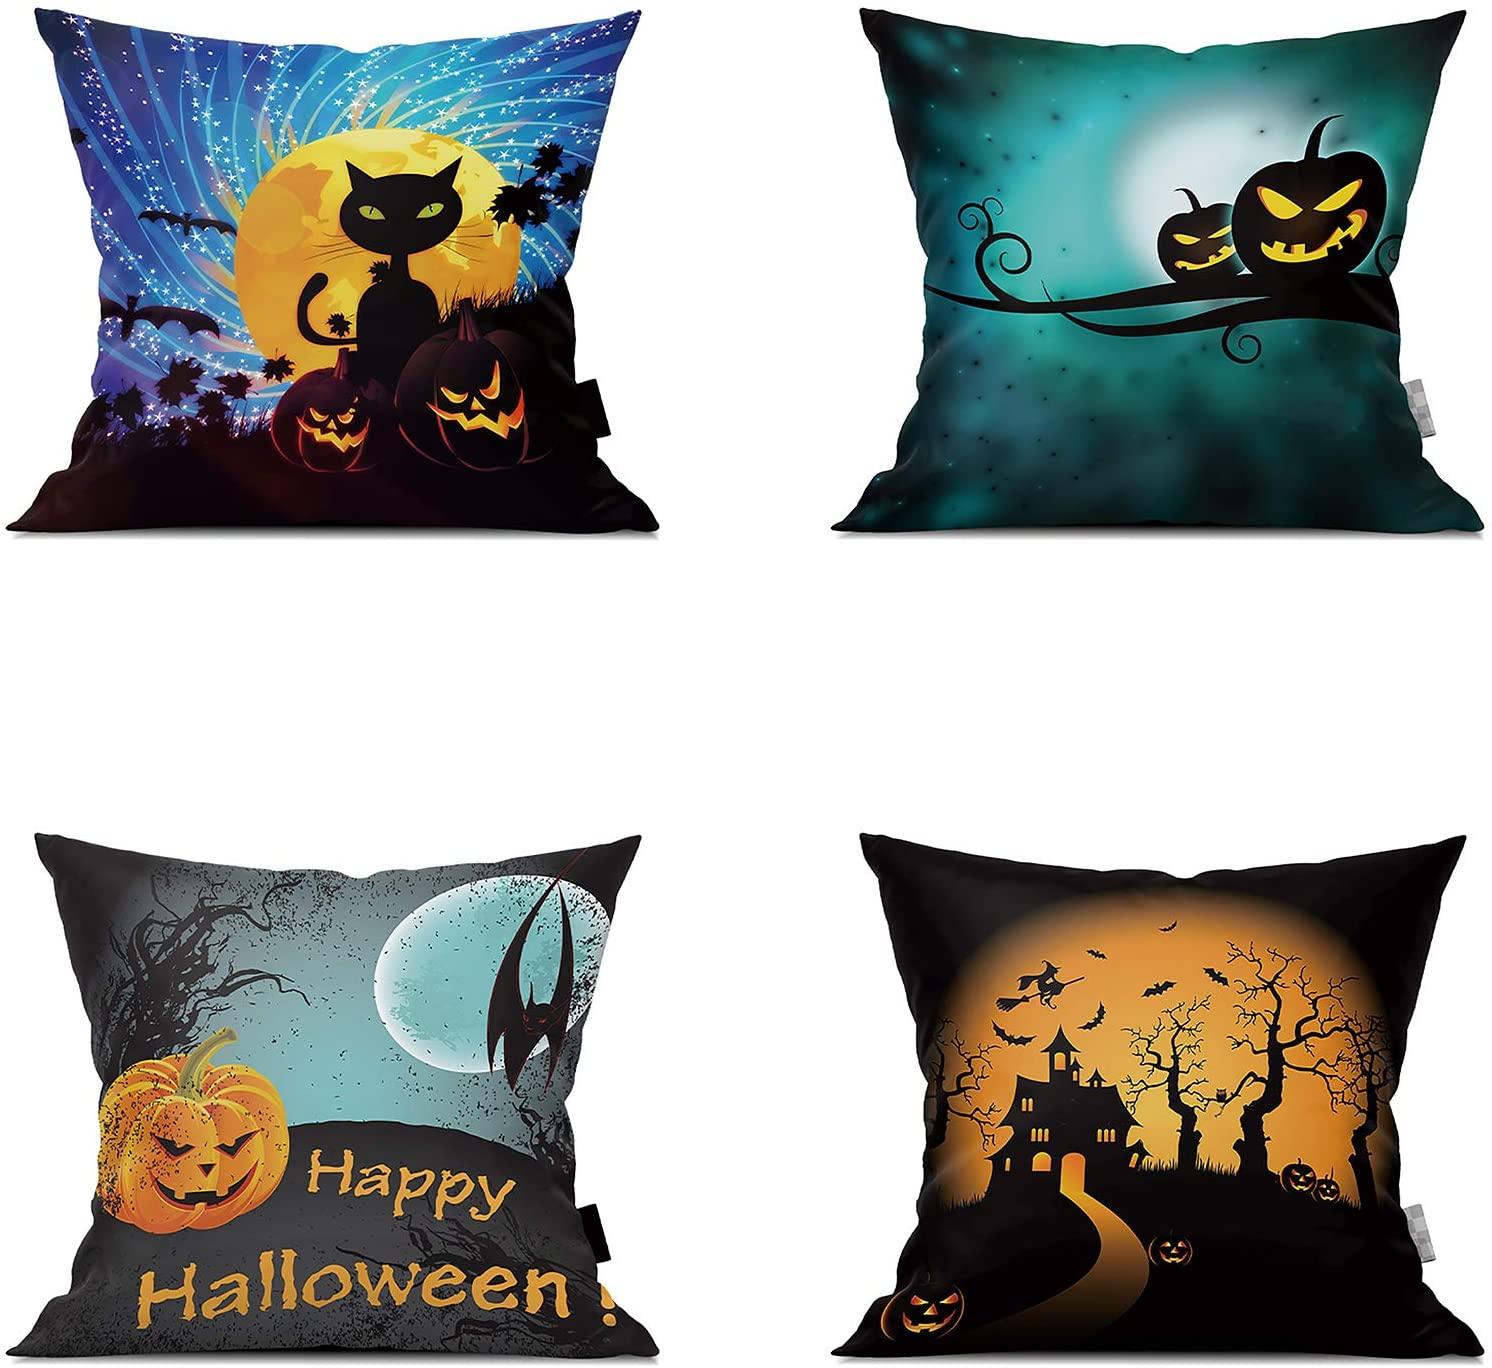 RTYGHJ Halloween Pillow Covers Double Sided Printing 4-Piece Set 18x18 Inch Pumpkin Pillow Castle Cushion Sofa Decorative Pillowcase A1